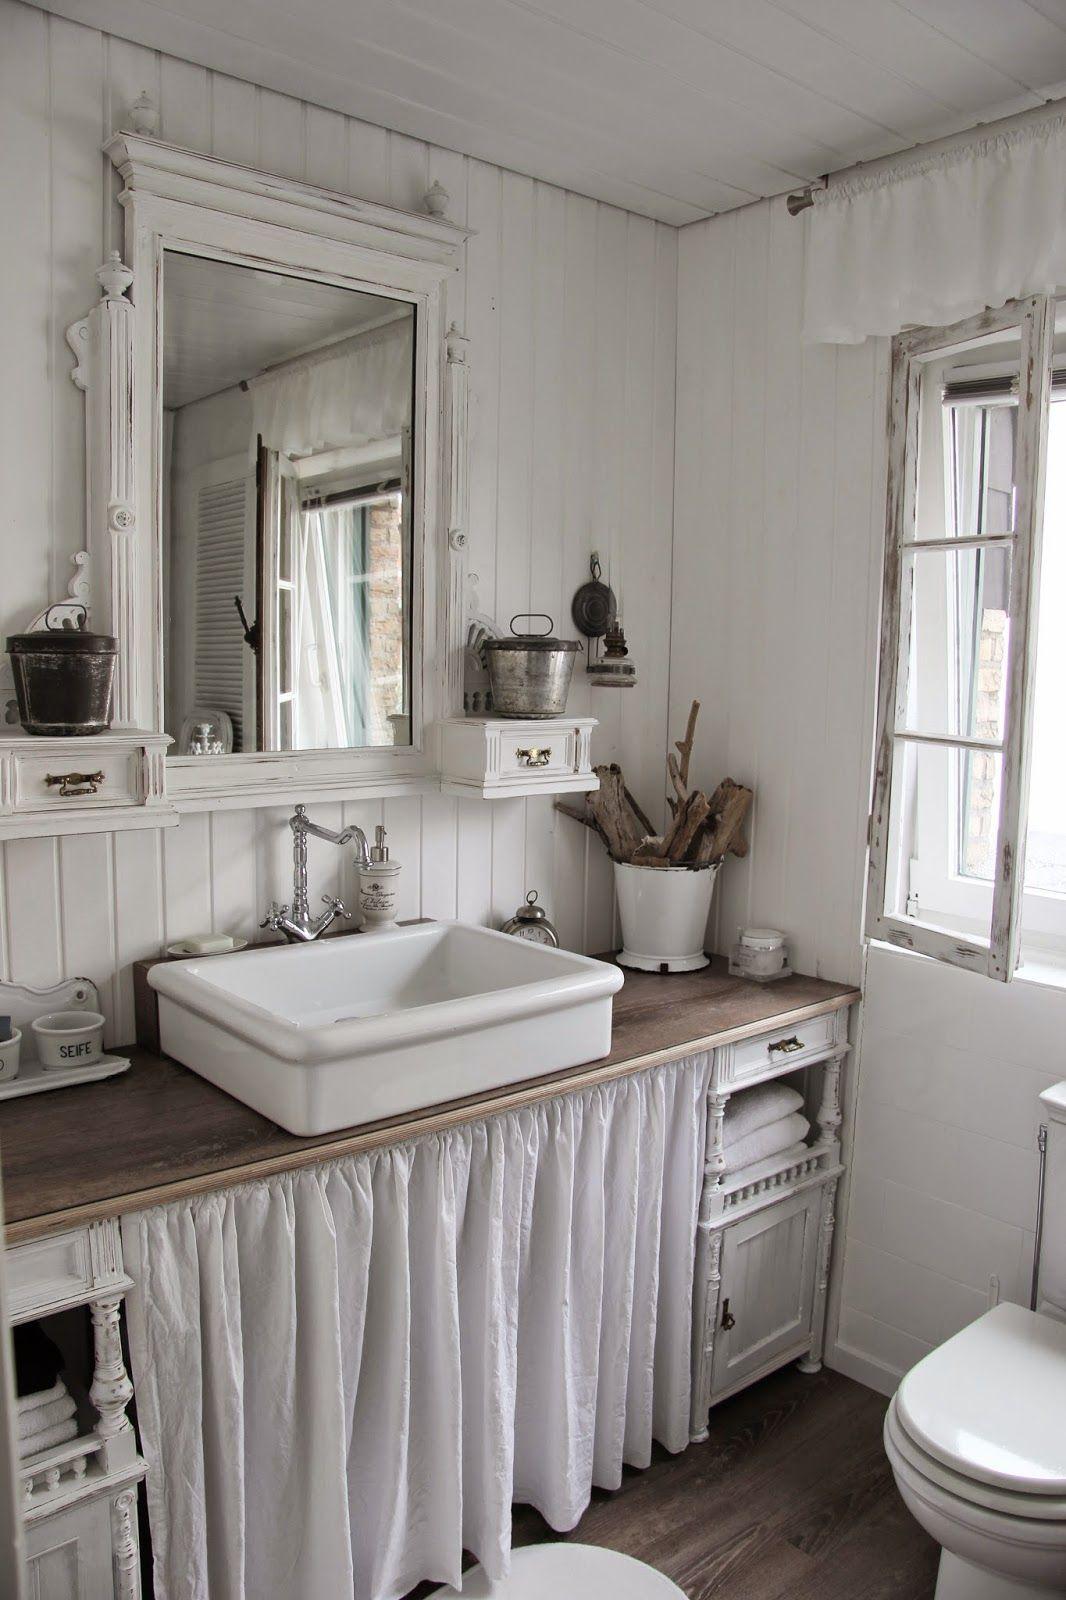 Shabby Bathroom This Old House Pinterest Badezimmer Bader Und